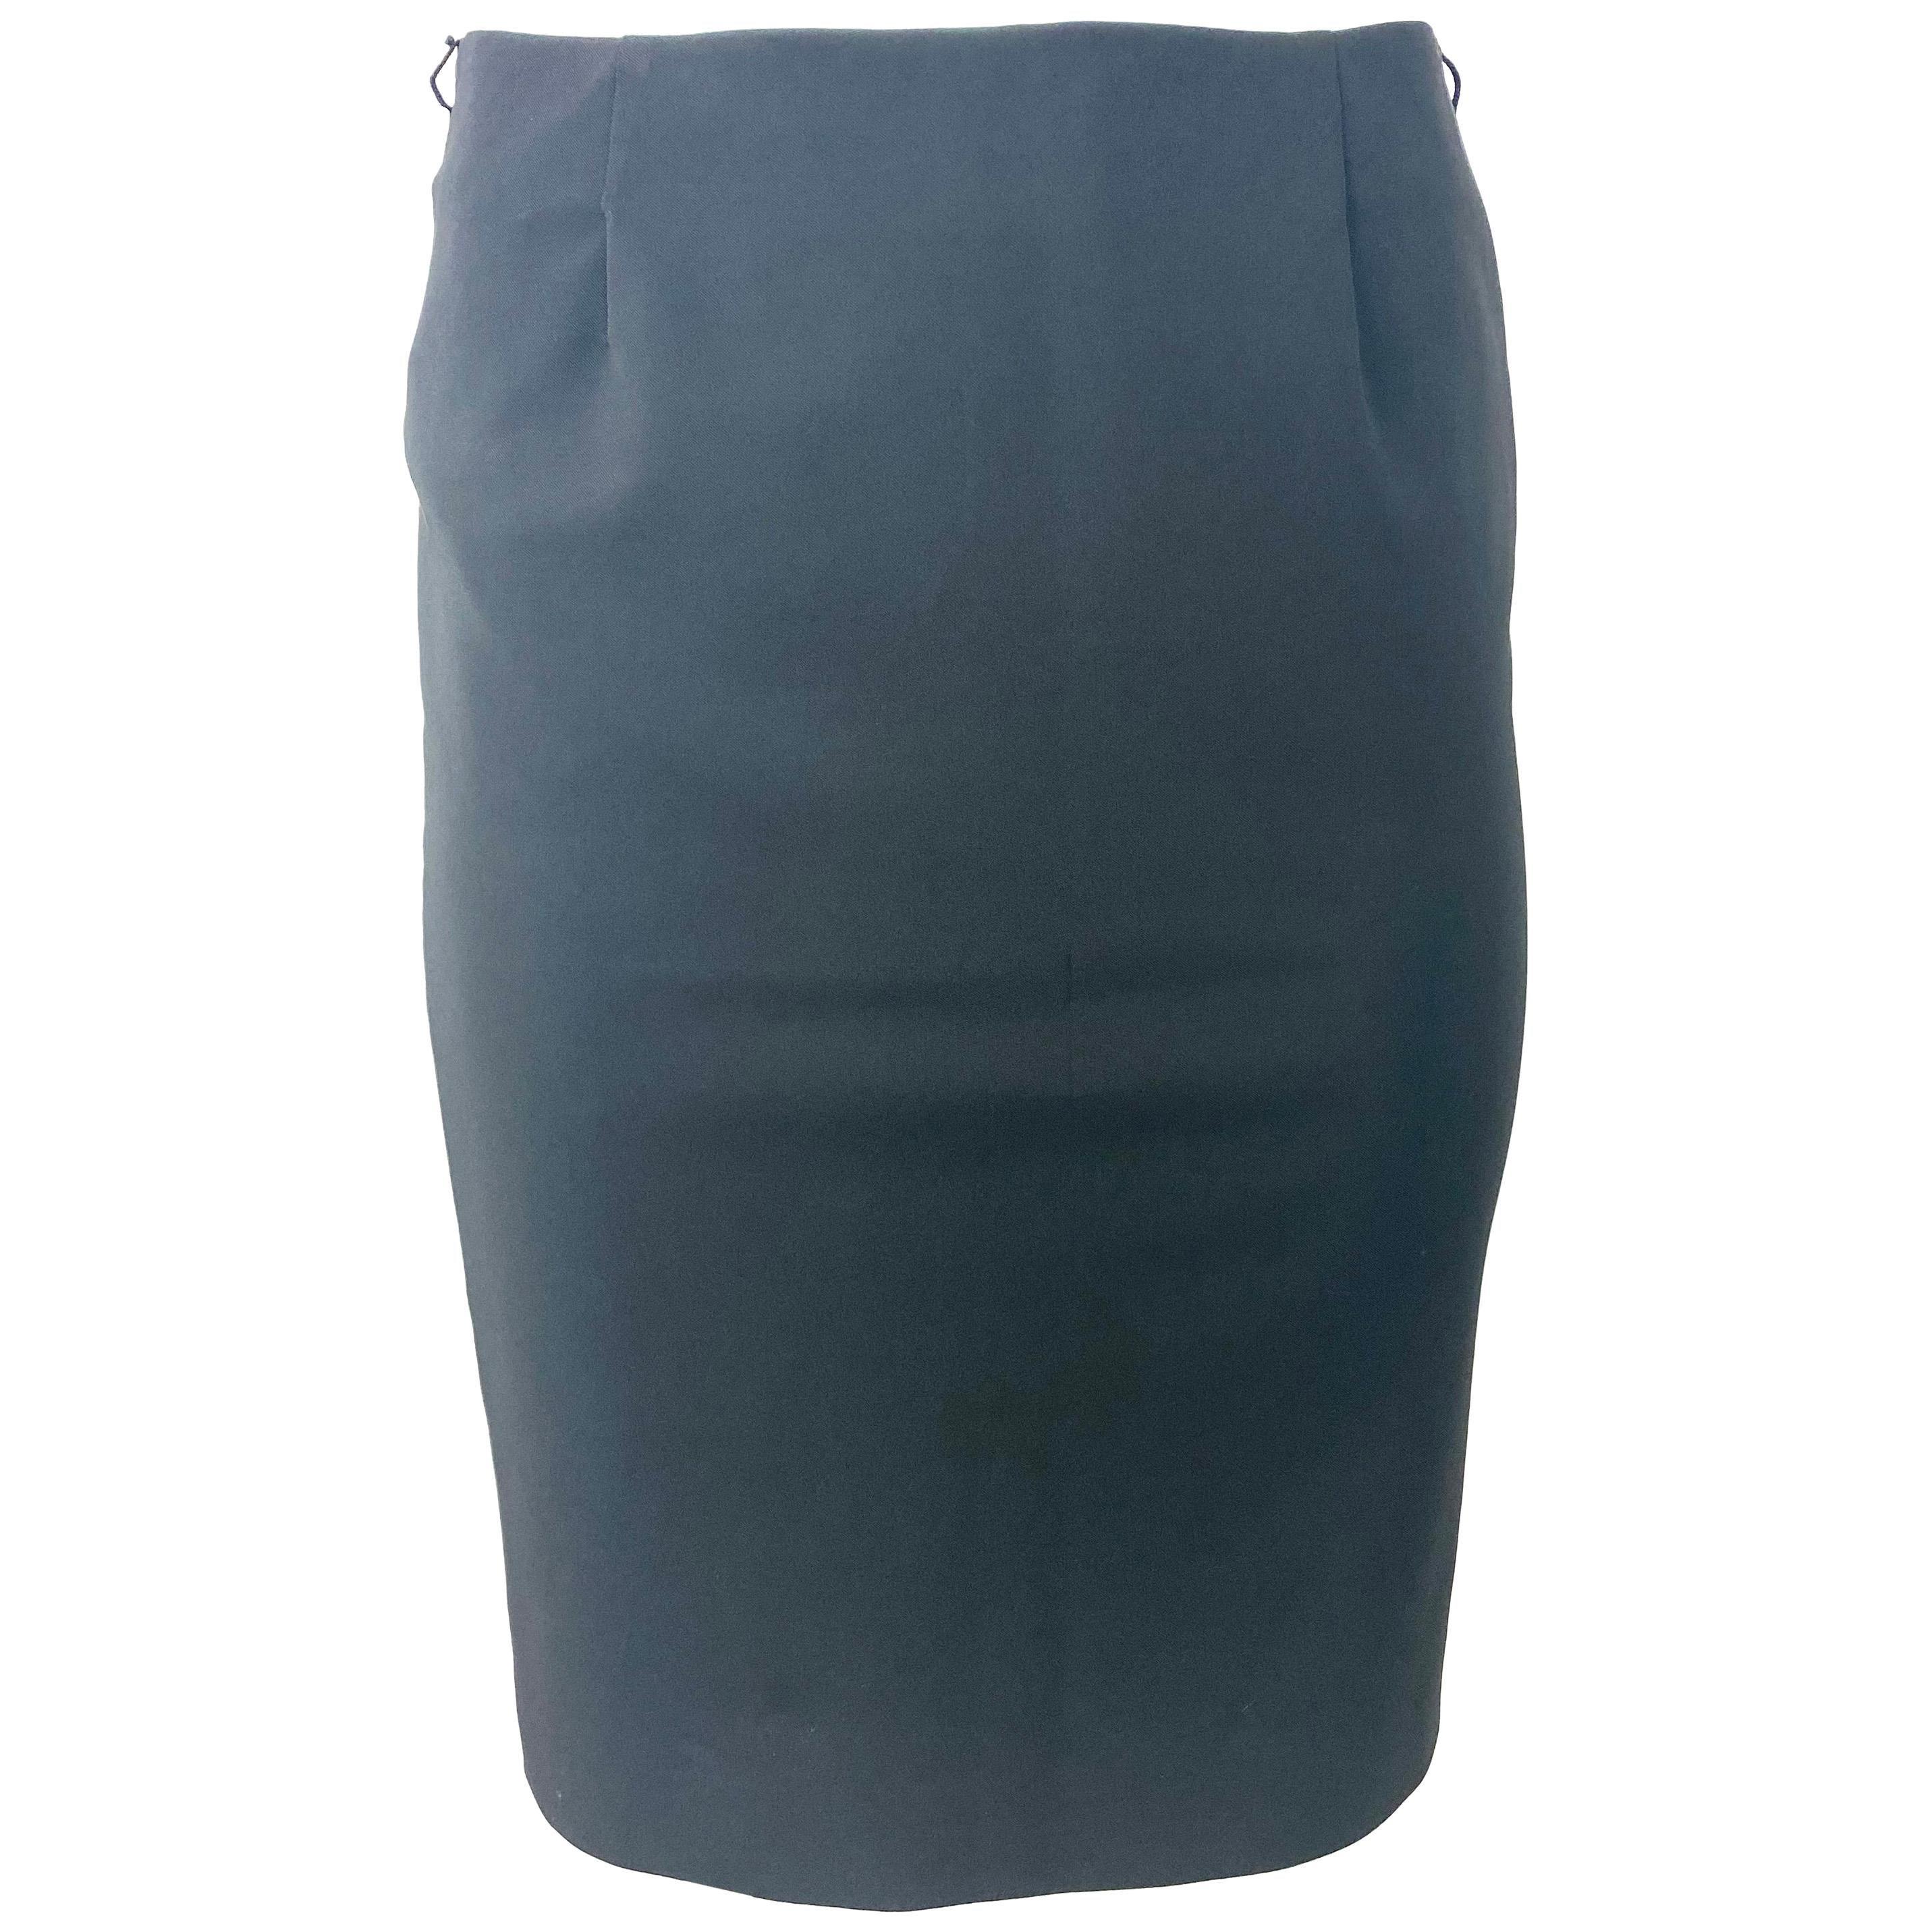 Prada Black Pencil Skirt, Size 40